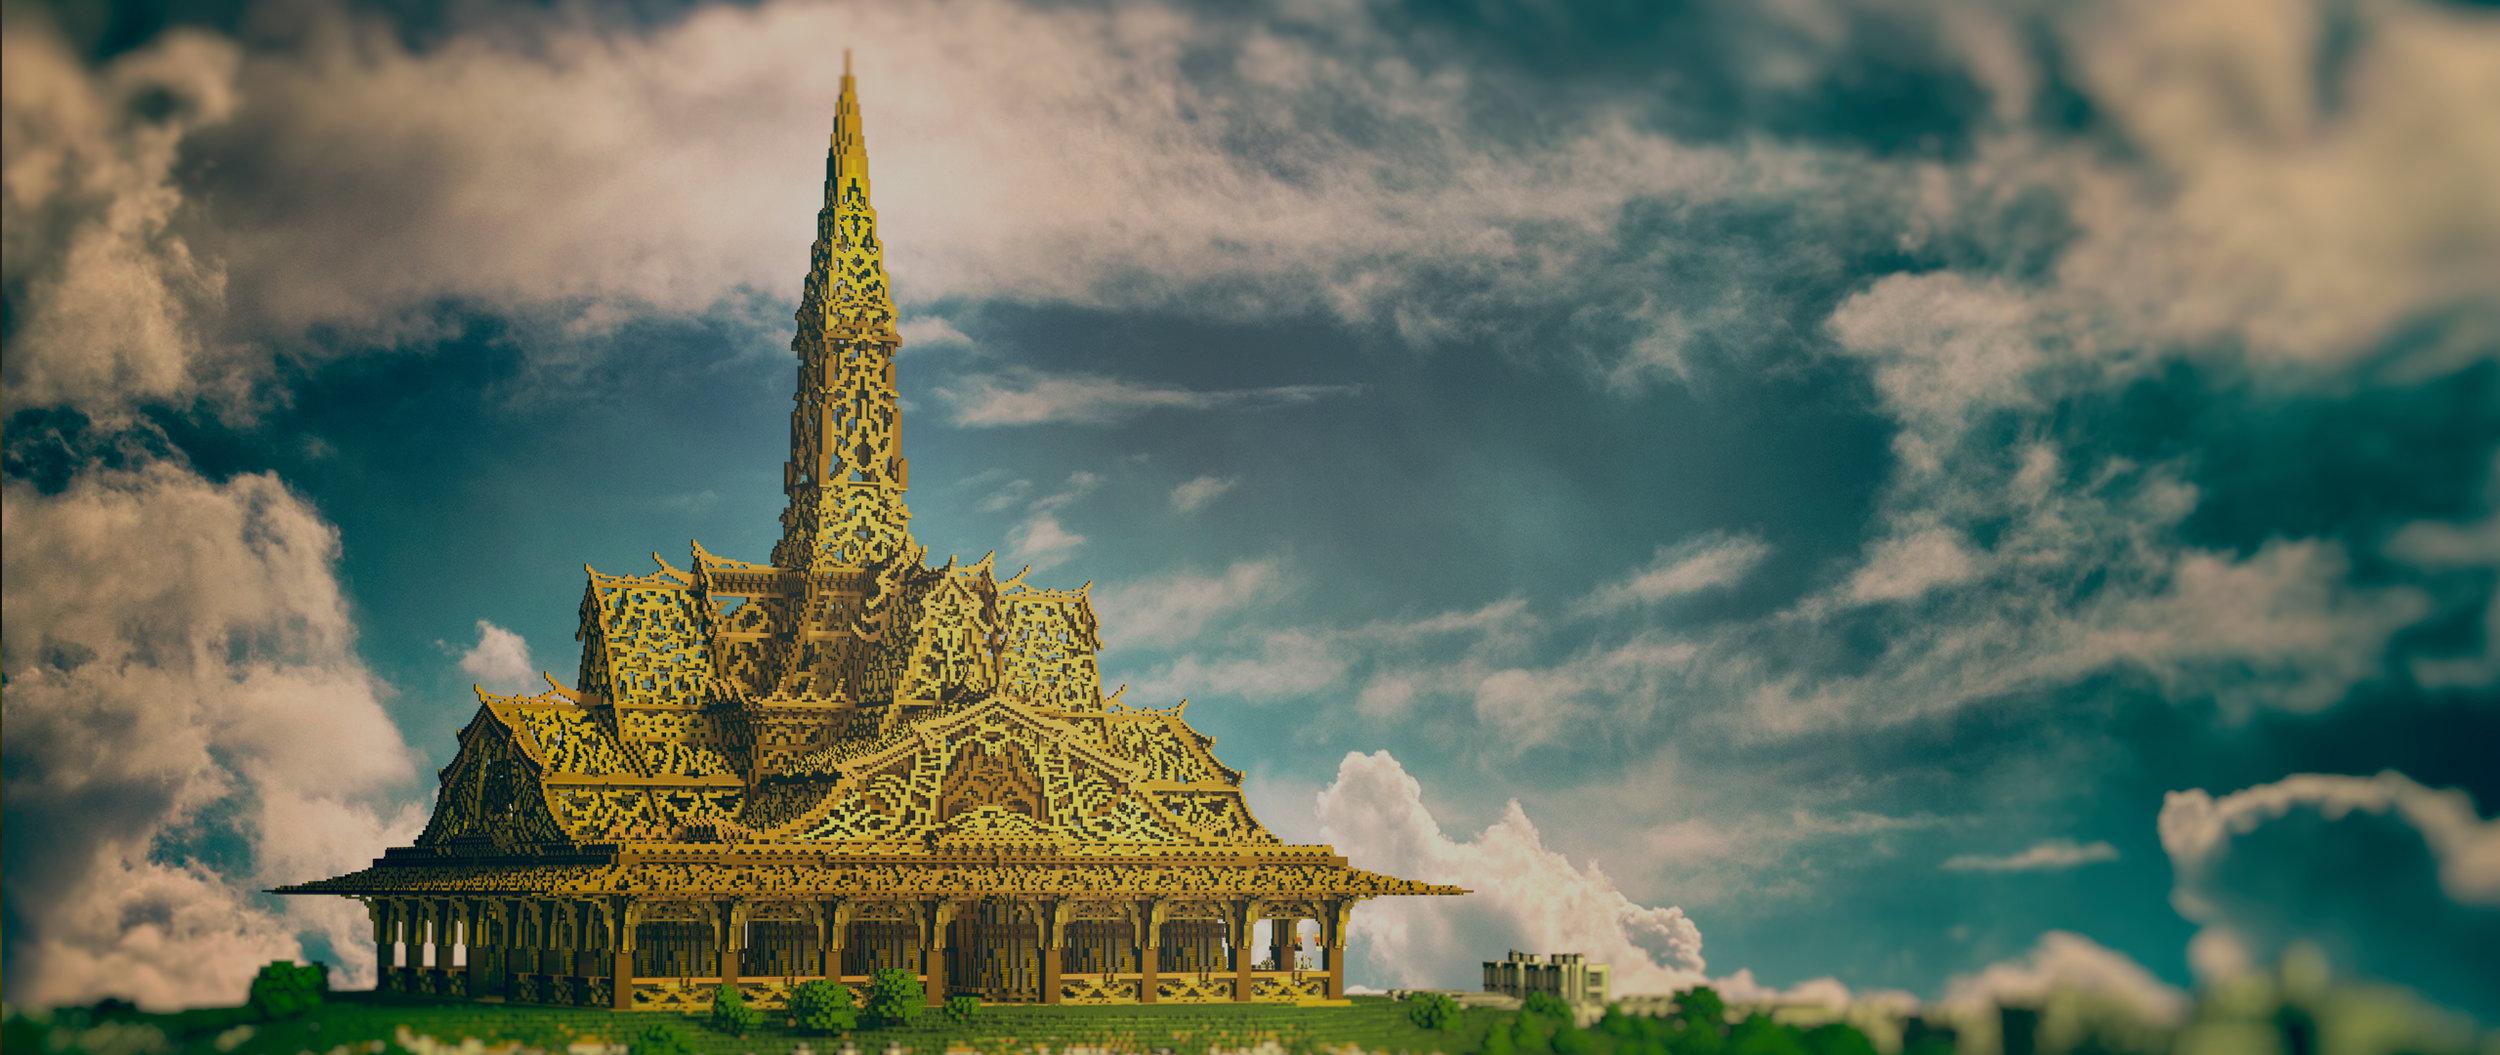 TempleCraft - Artichoke